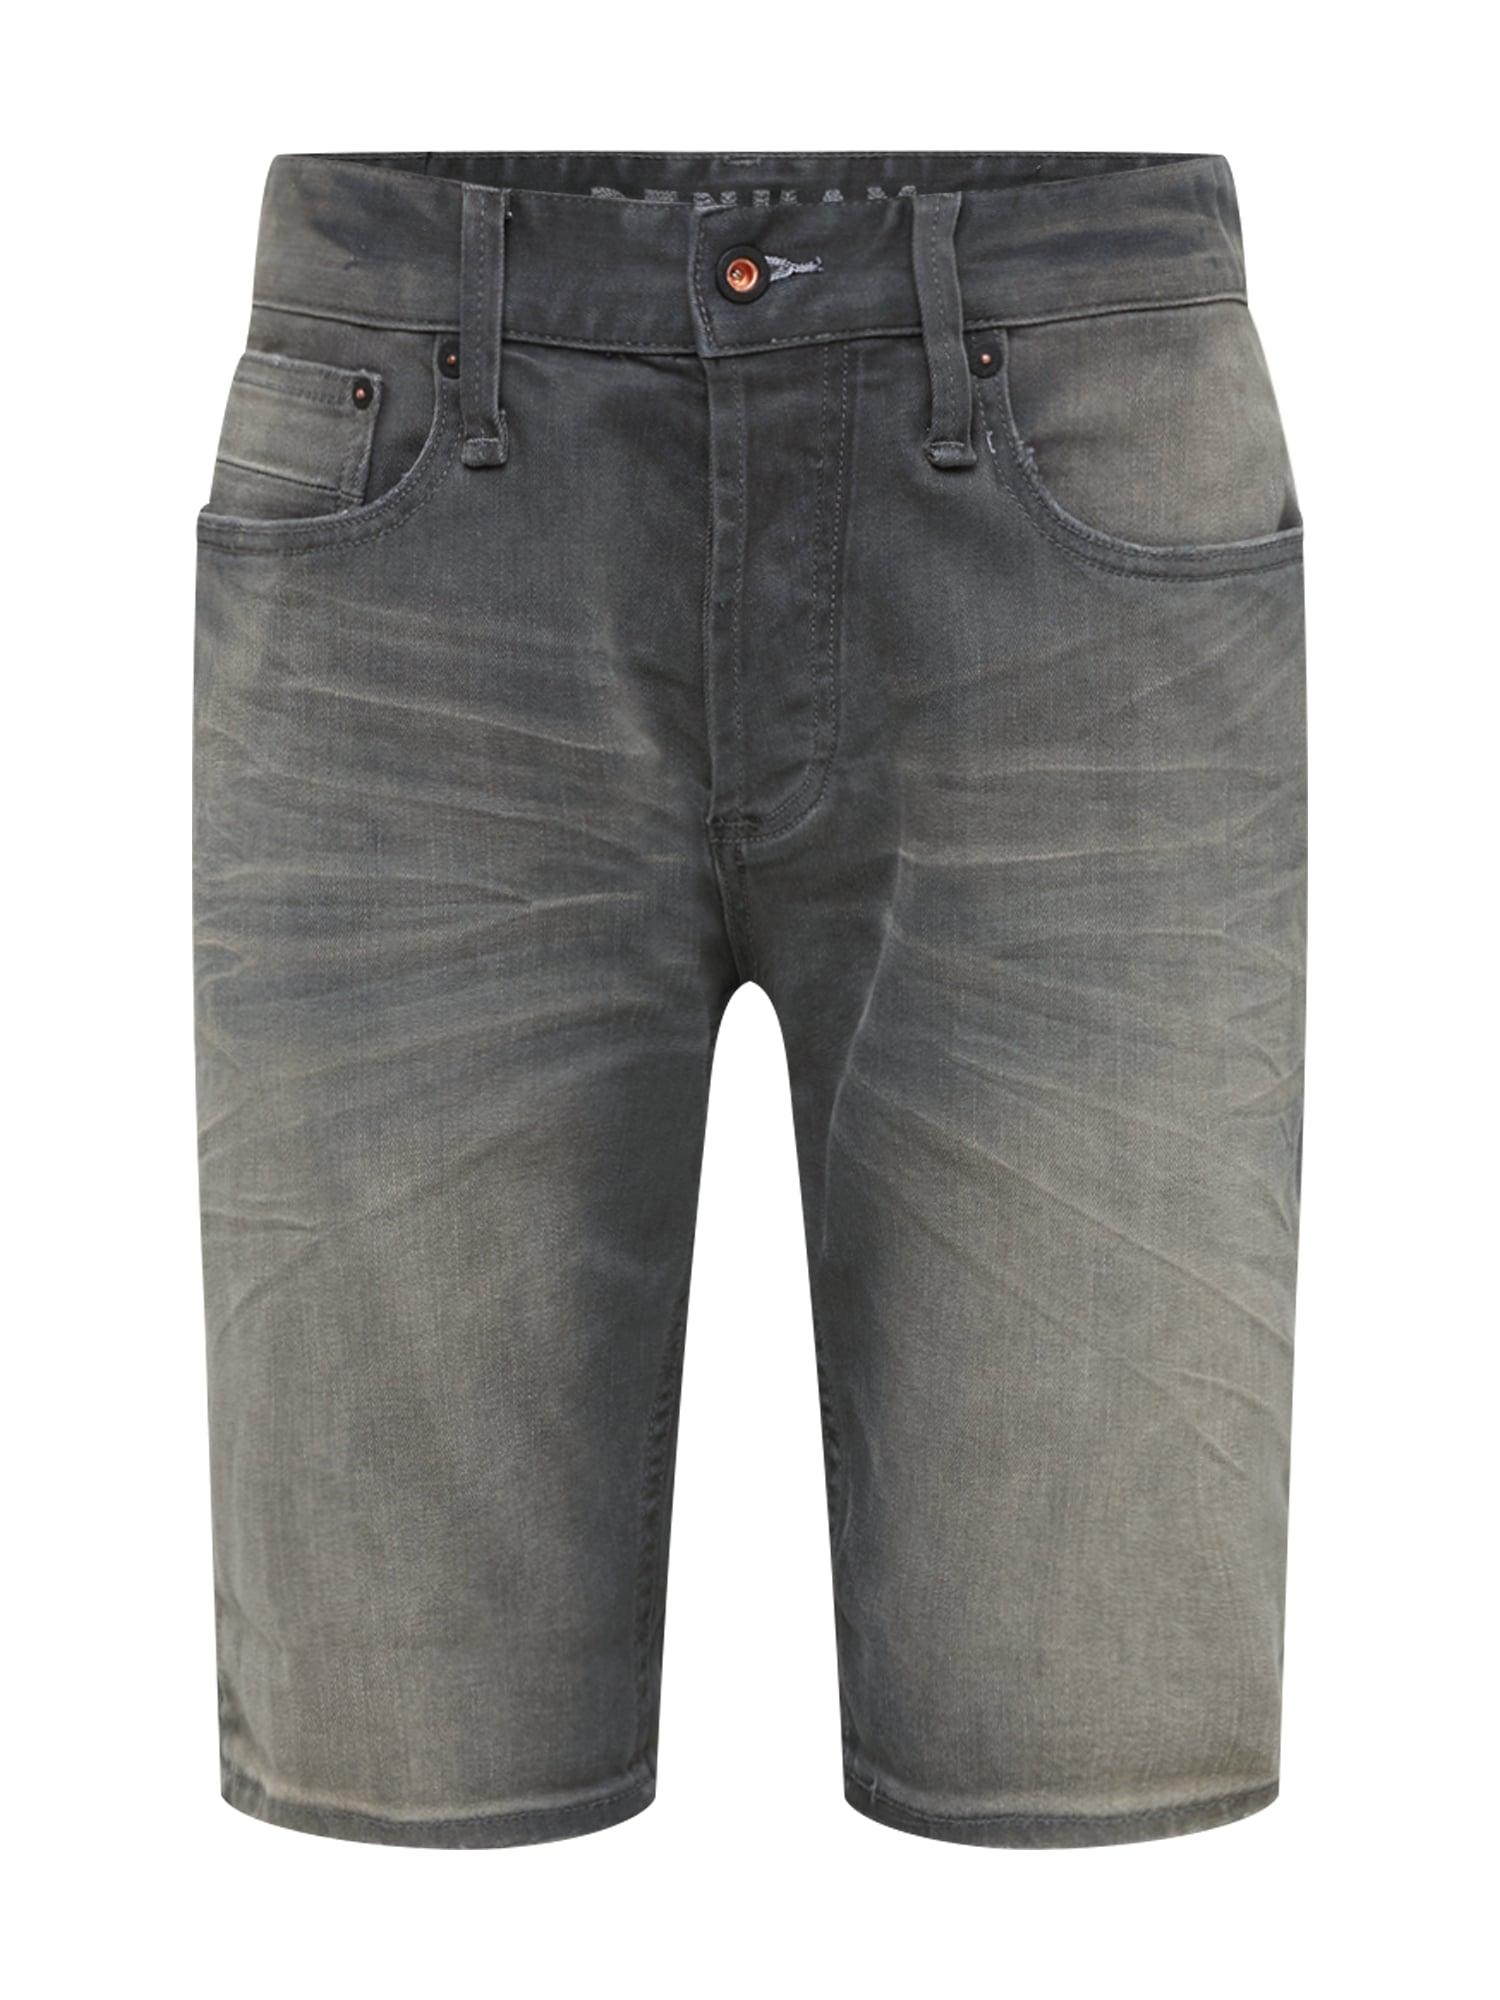 Jeansshorts 'RAZOR' | Bekleidung > Shorts & Bermudas > Jeans Shorts | Denham